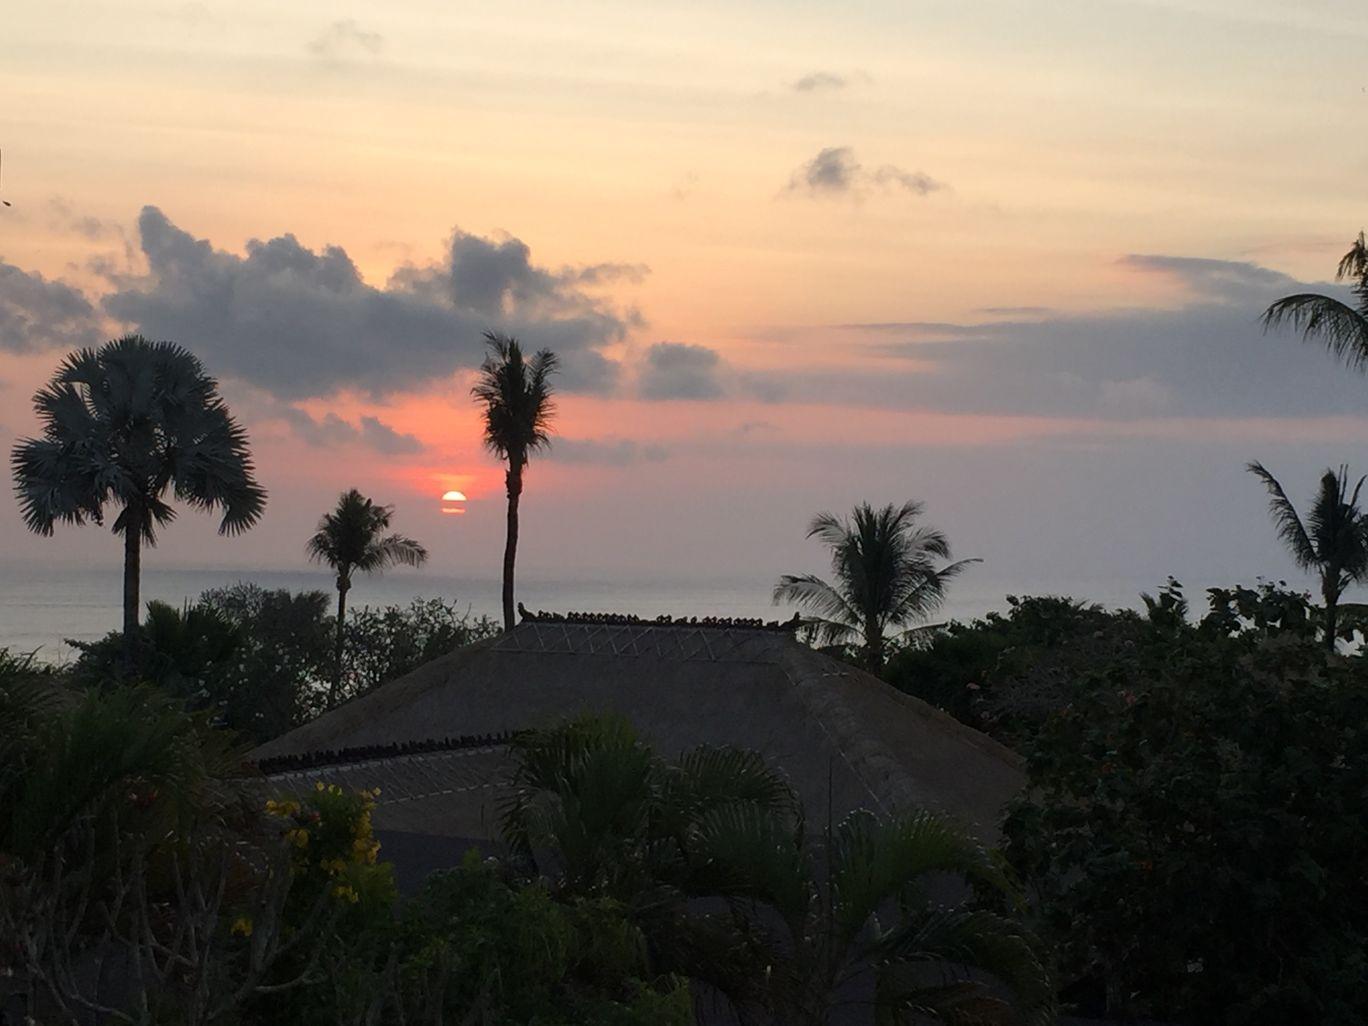 Photo of Bali By Apeksha Turakhia